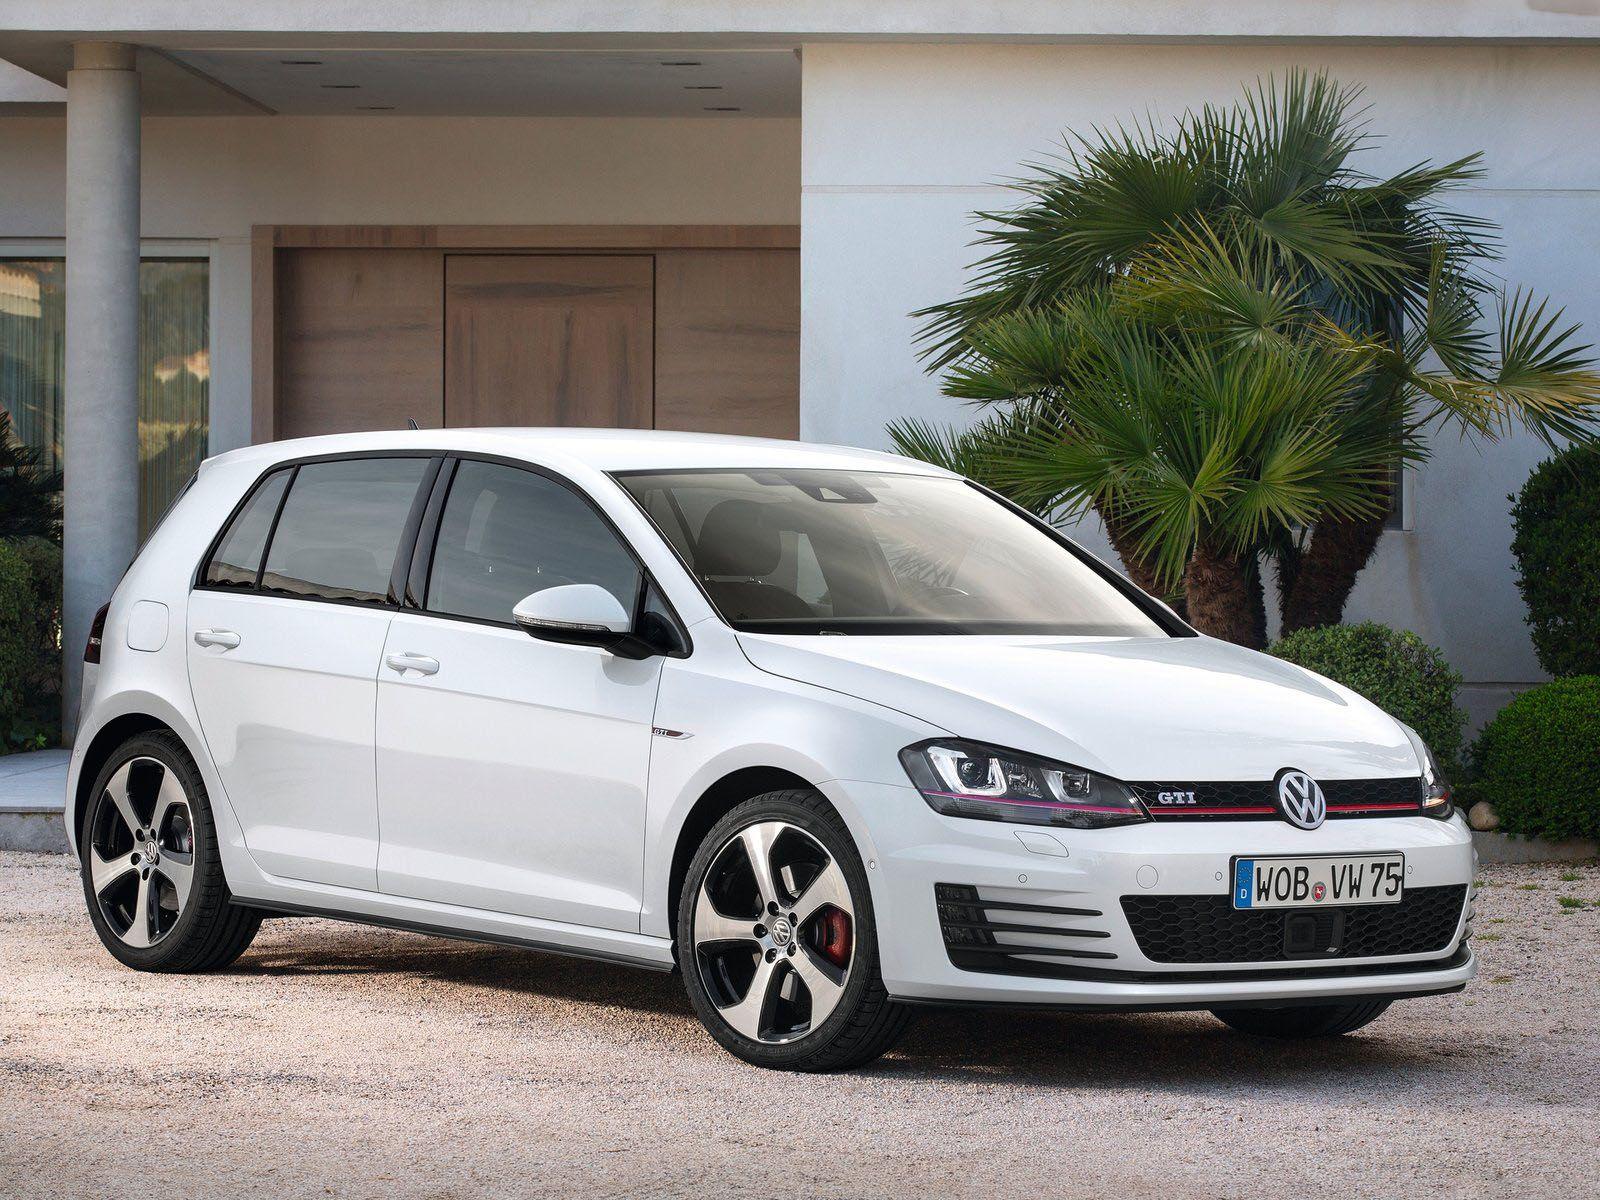 Carro Novo Volkswagen Golf Gti 2014 Volkswagen Golf Gti 2014